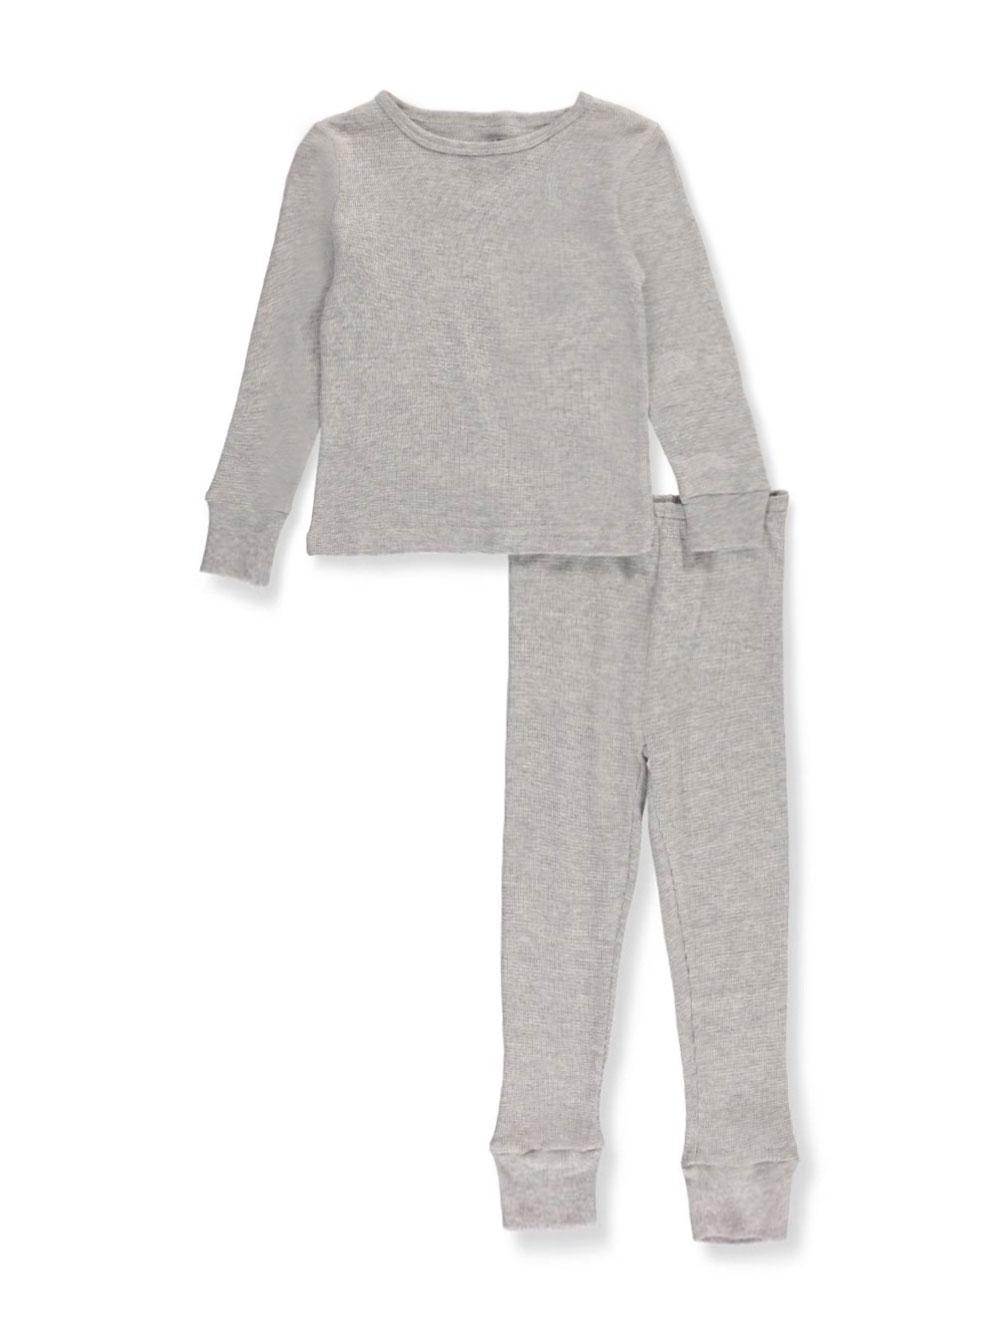 Find great deals on eBay for Toddler Thermal Underwear in Baby Girls' Underwear (Newborn-5T). Shop with confidence.